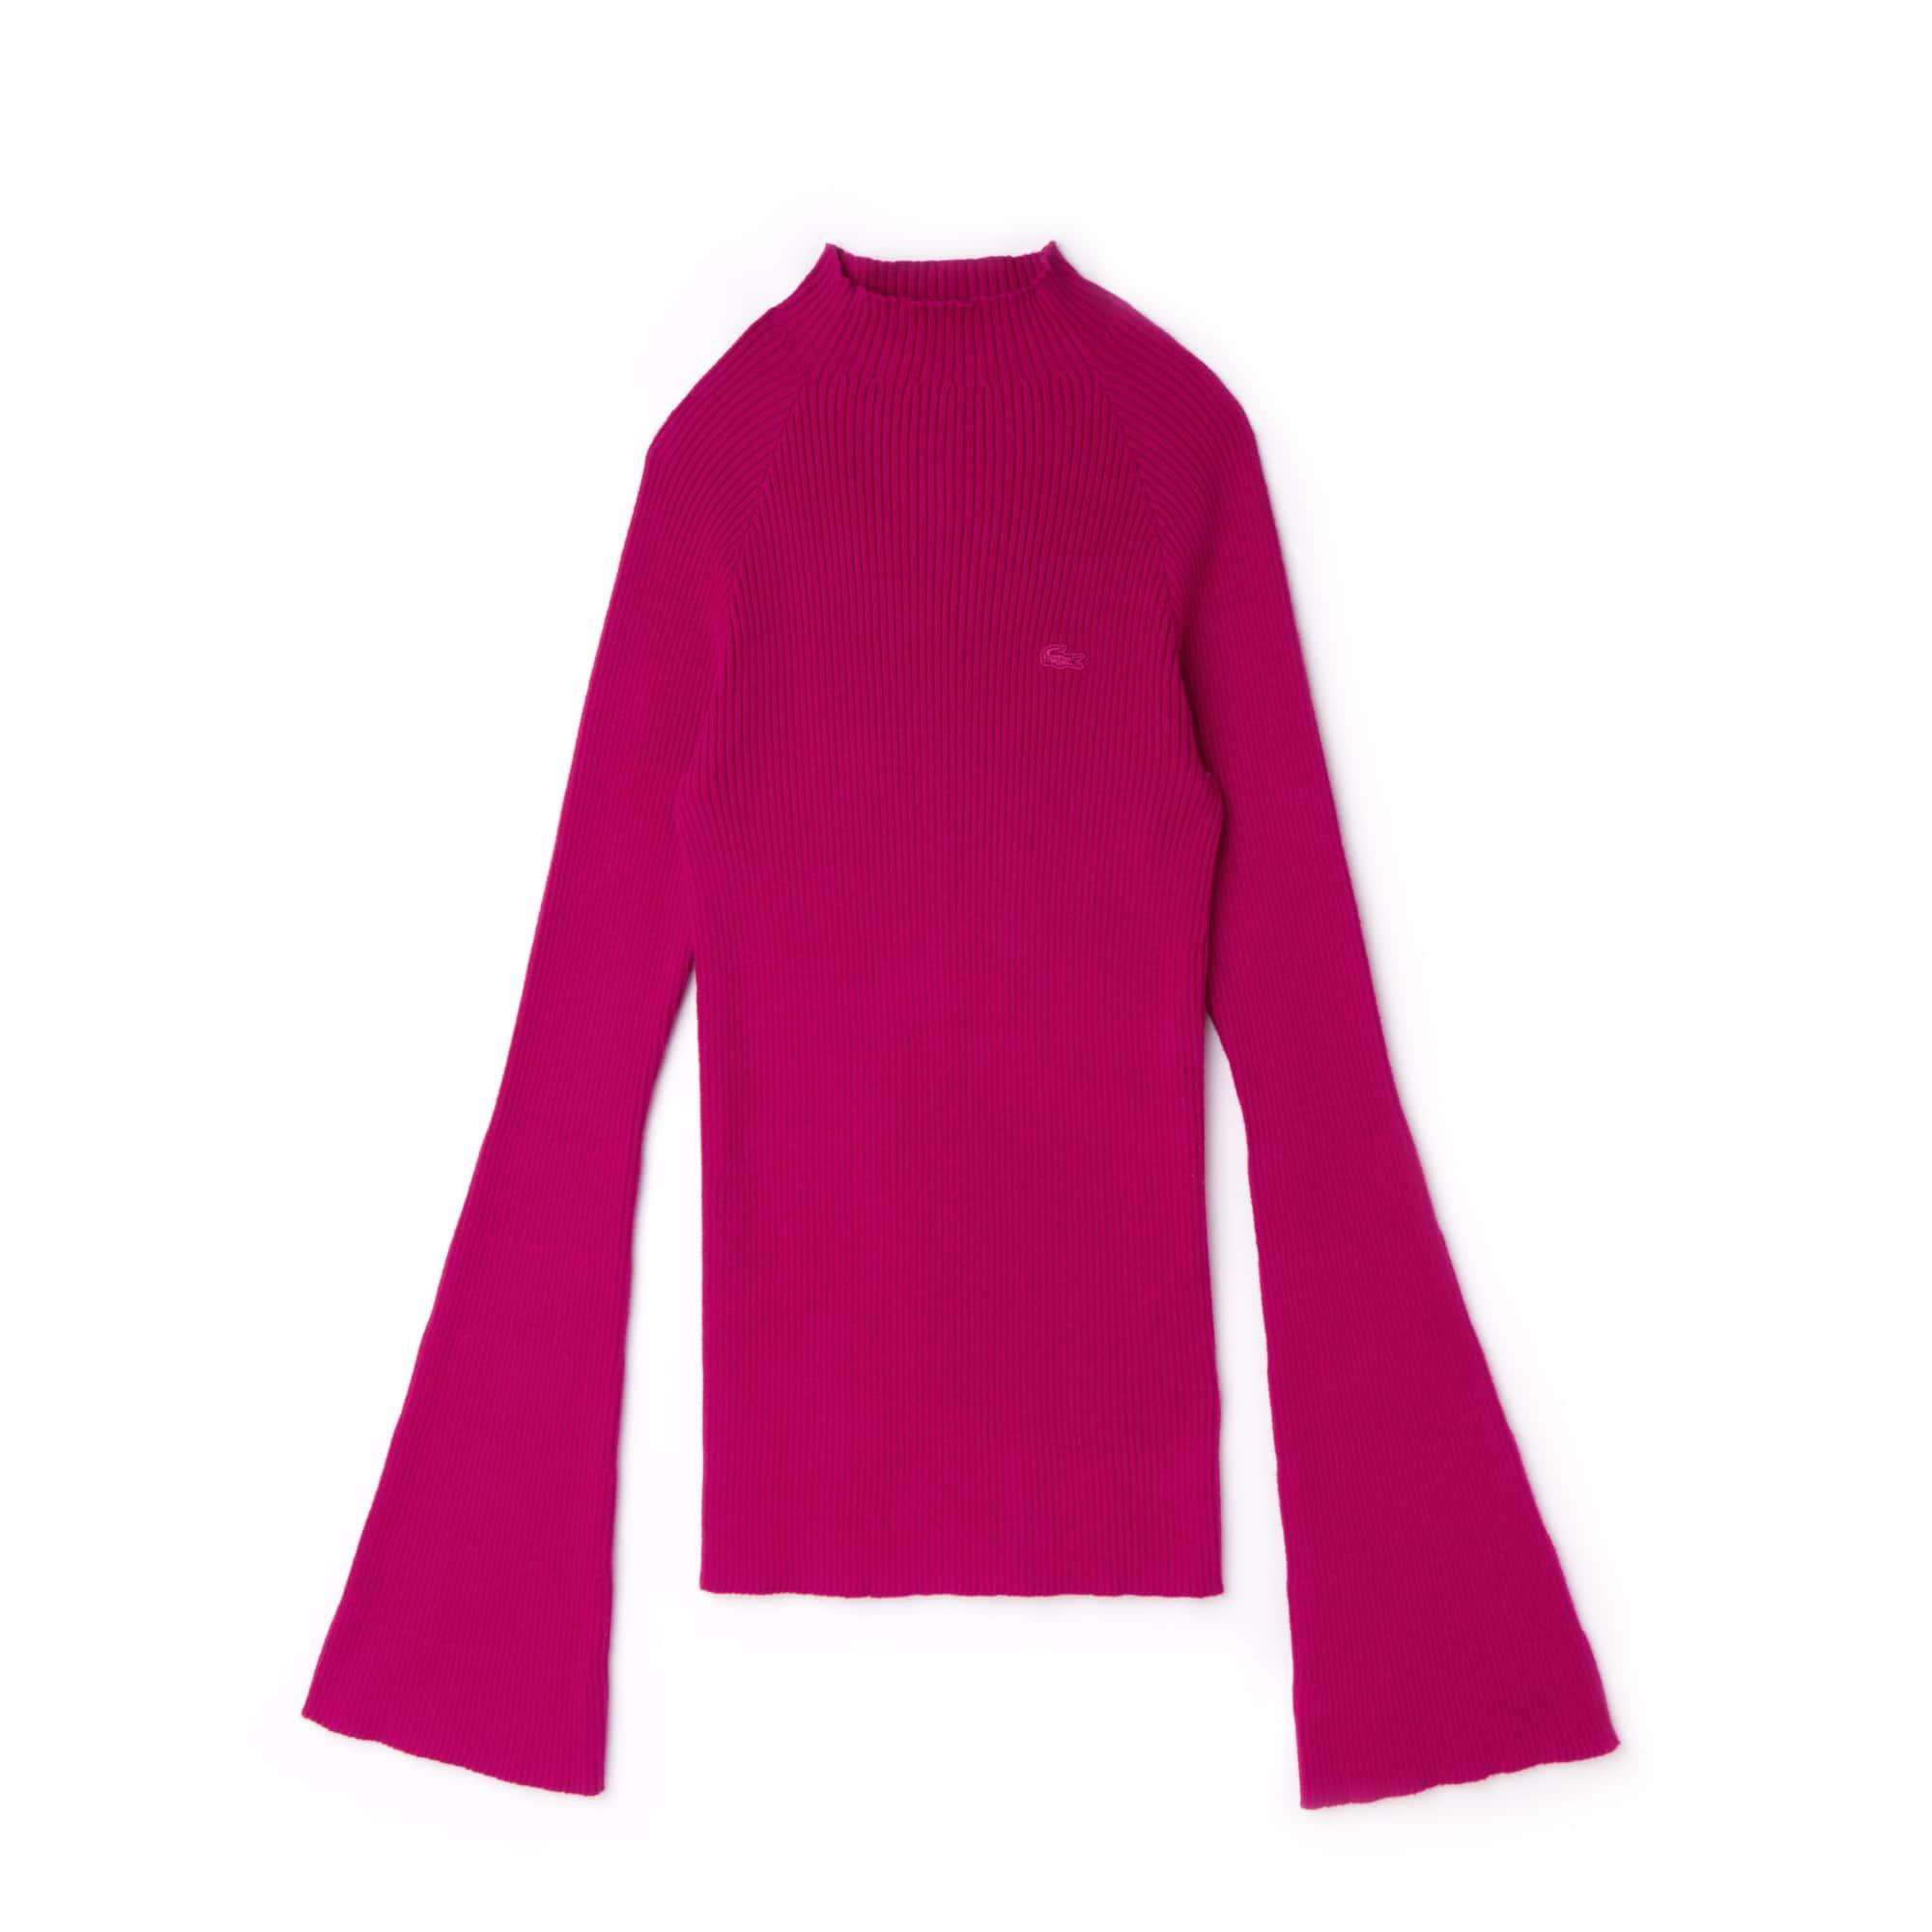 2cb39410da Women's Lacoste LIVE Ribbed Cotton And Cashmere Sweater   LACOSTE